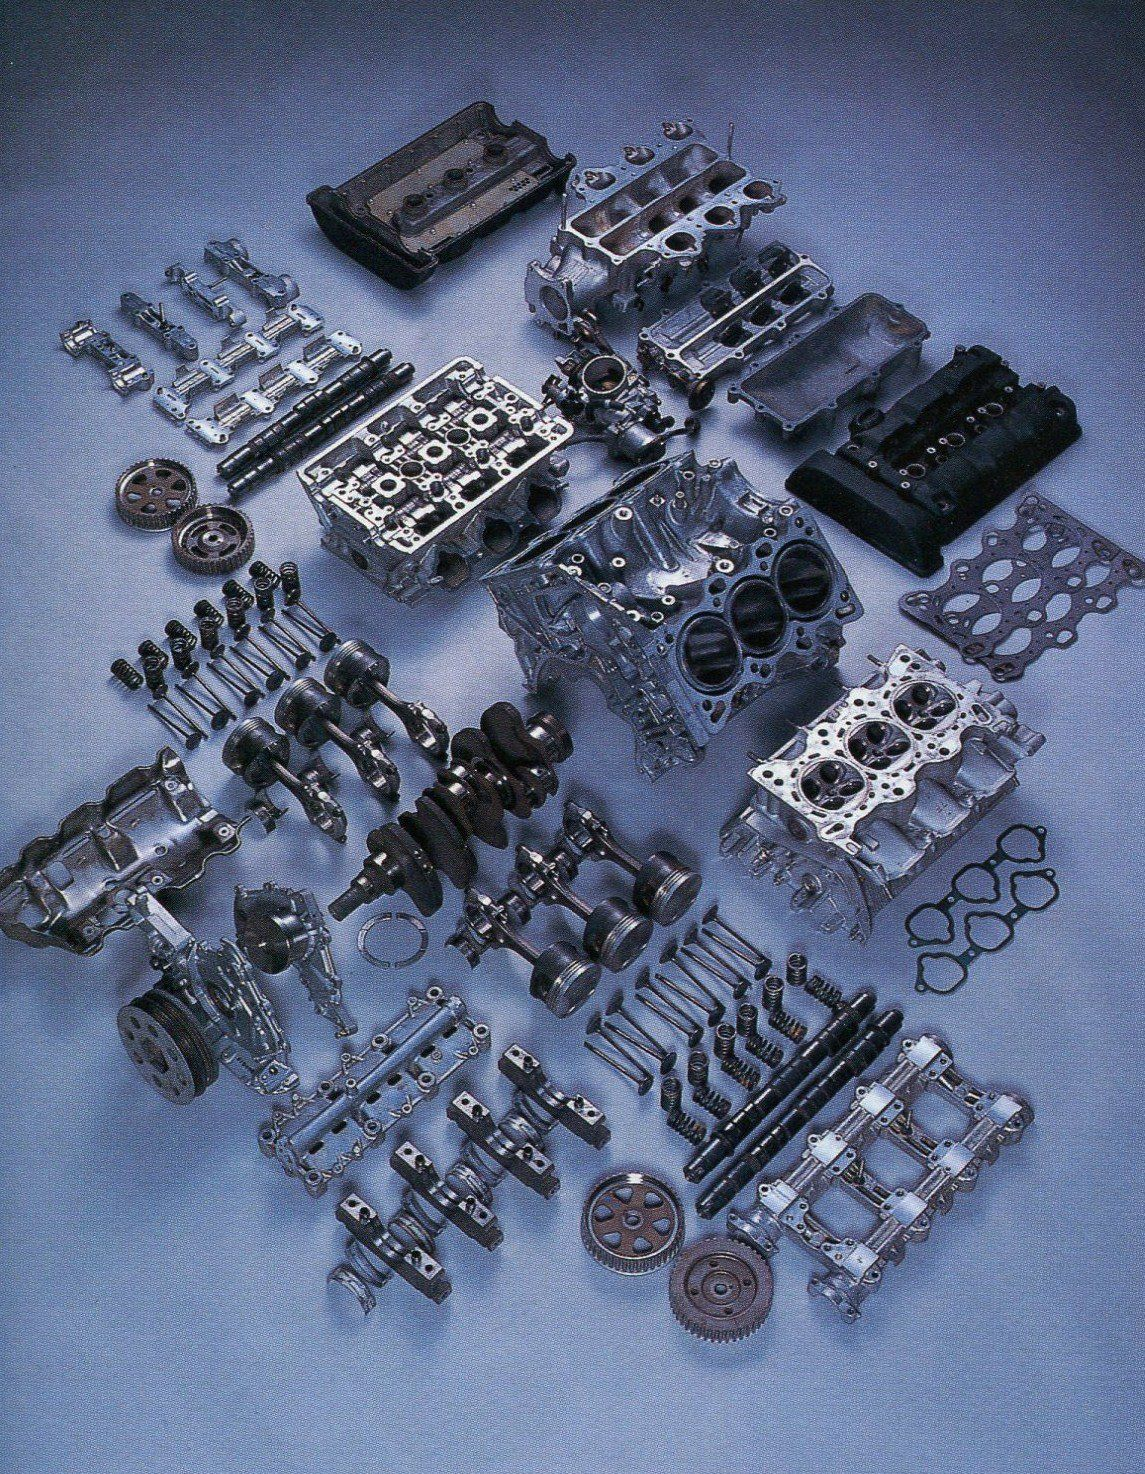 Honda Nsx Engine Breakdown